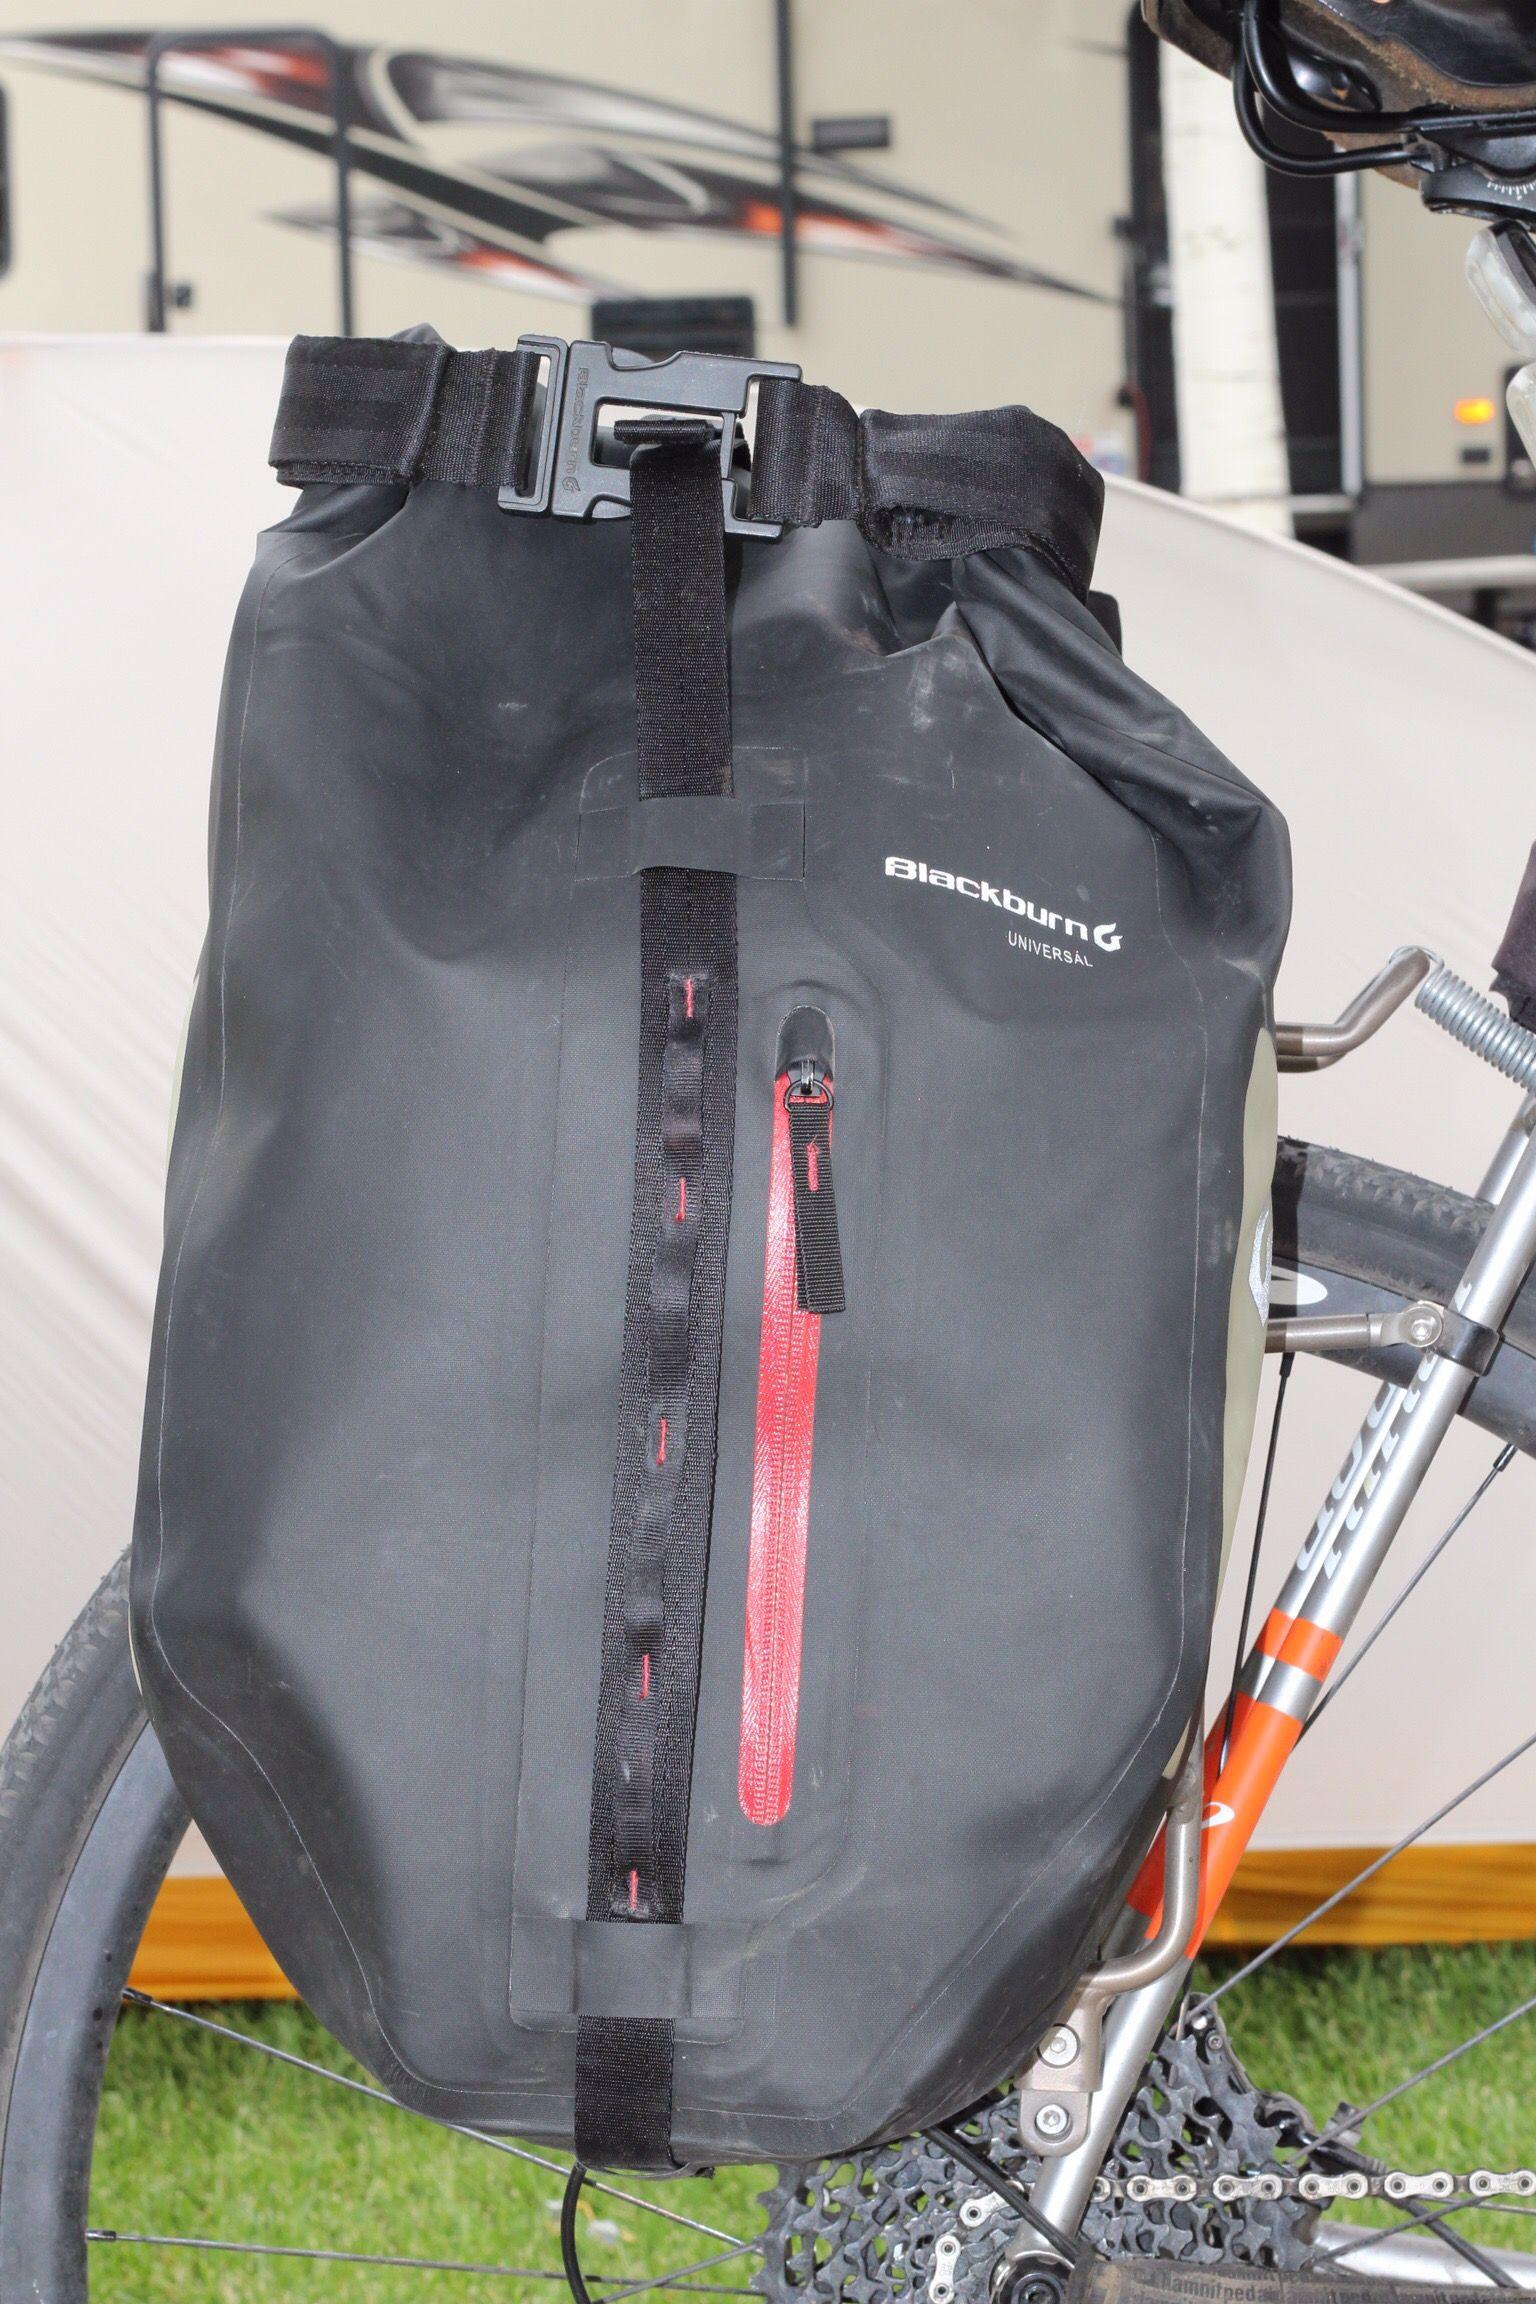 Pin By Maciekmm On Buckle Duffle Duffle Bag Bikepacking